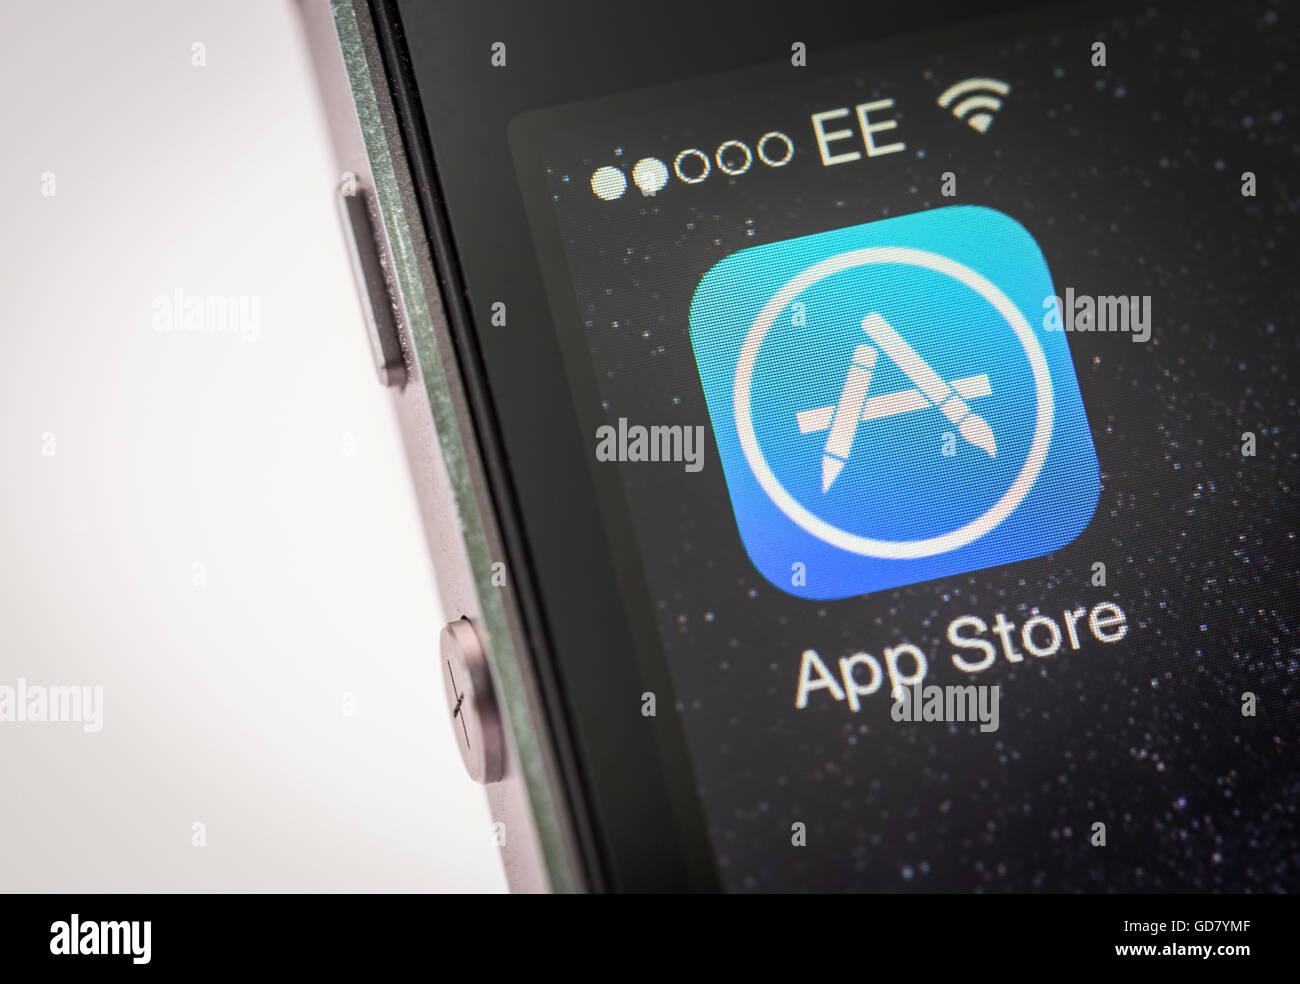 App Store de Apple iPhone App en un teléfono inteligente. Imagen De Stock